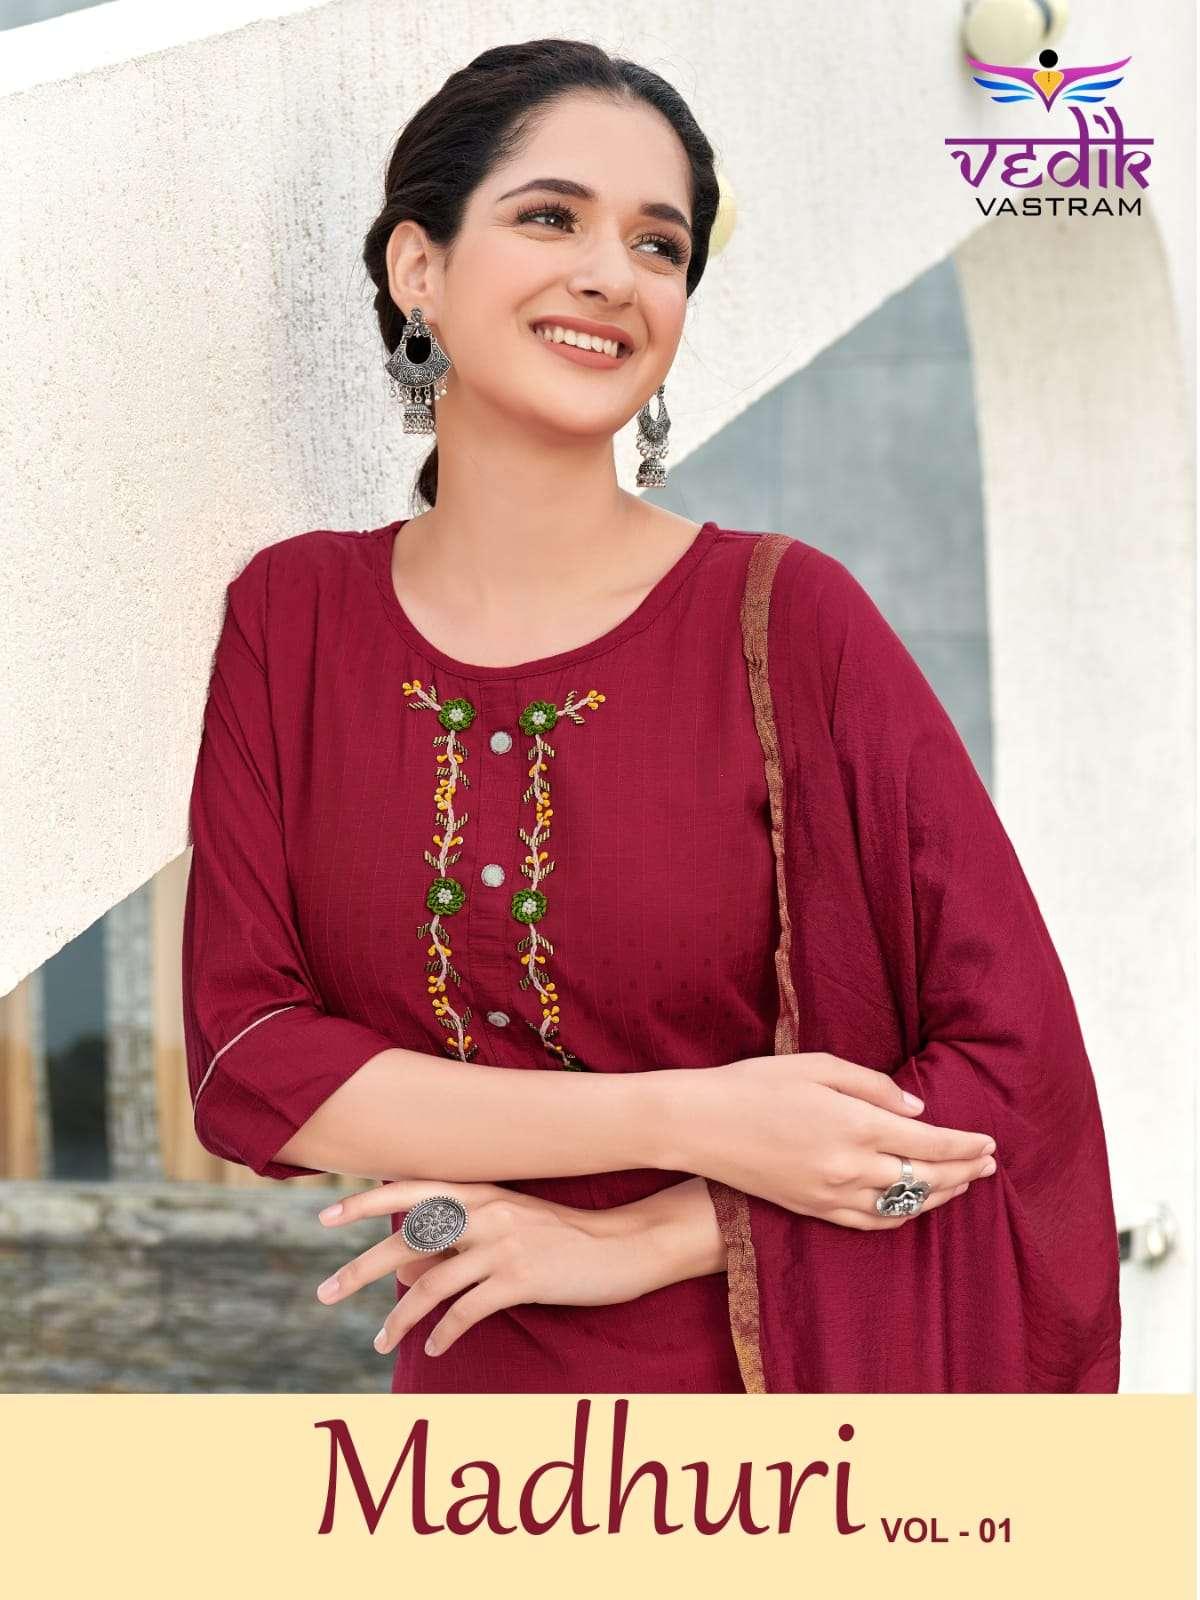 Vedik vastram Madhuri Vol 1 Fancy Cotton Kurti Bottom Dupatta Sets